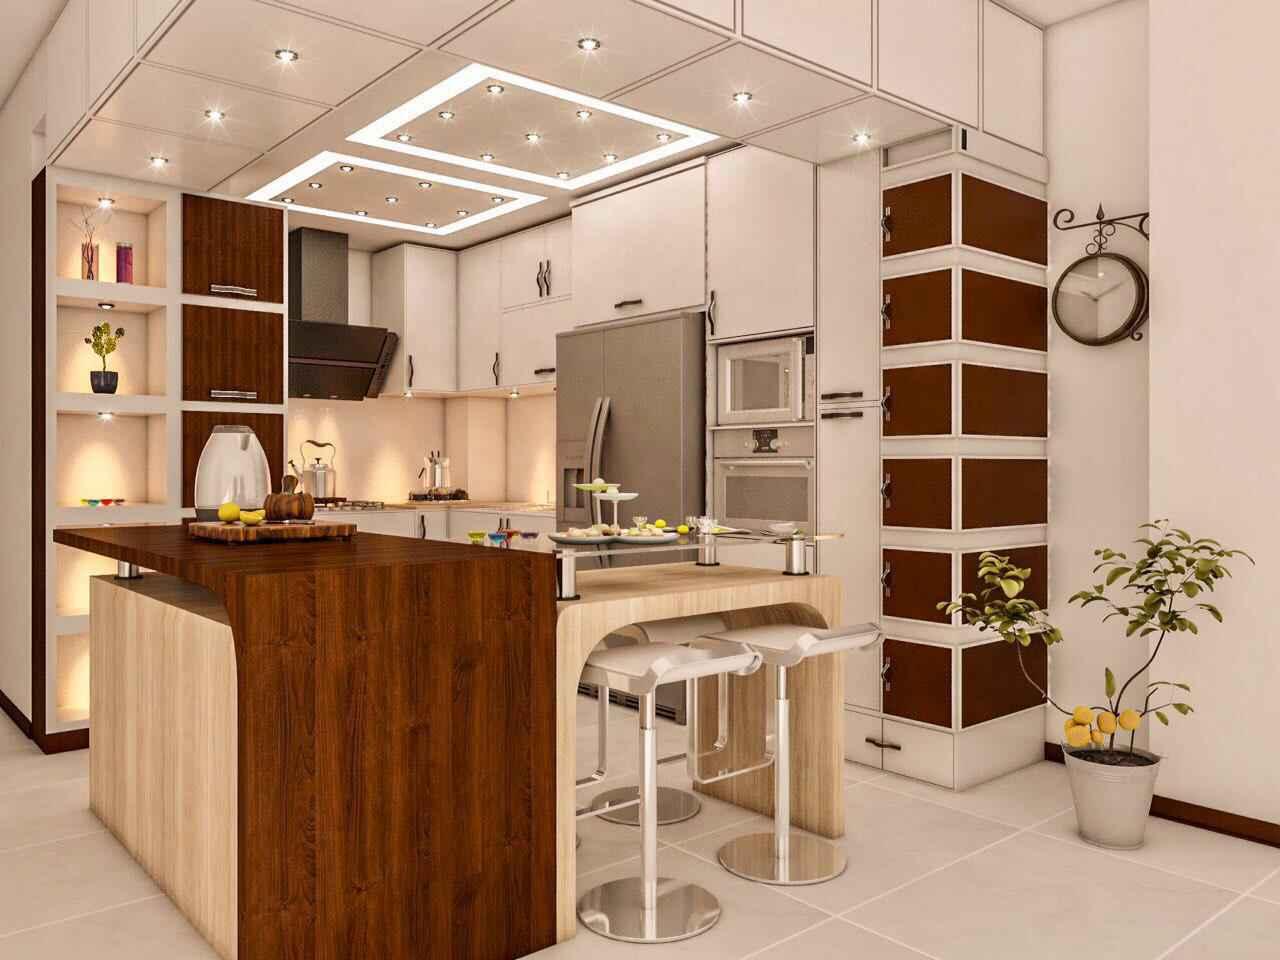 طراحی آشپزخانه مدرن 25